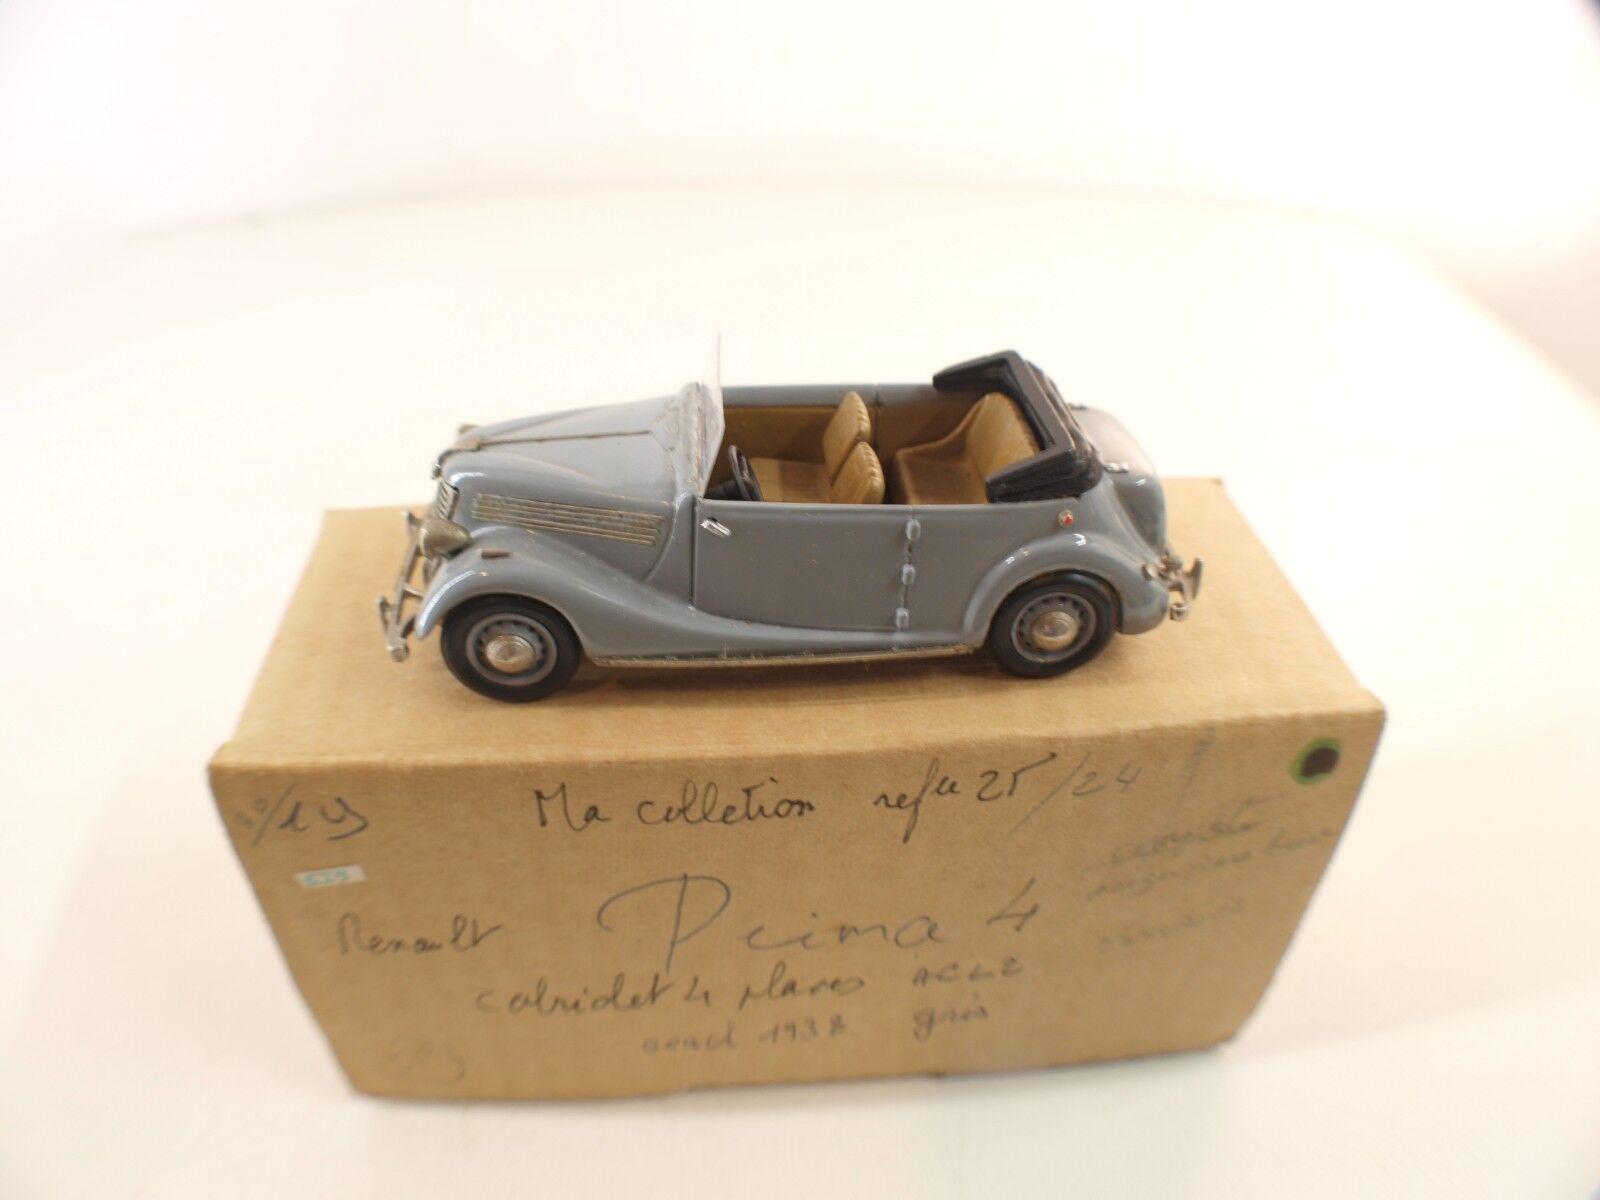 MA COLLECTION (SUISSE) 24 • Renault Primaquatre ACL2 Cabriolet Cabriolet Cabriolet 1938 •  cómodo